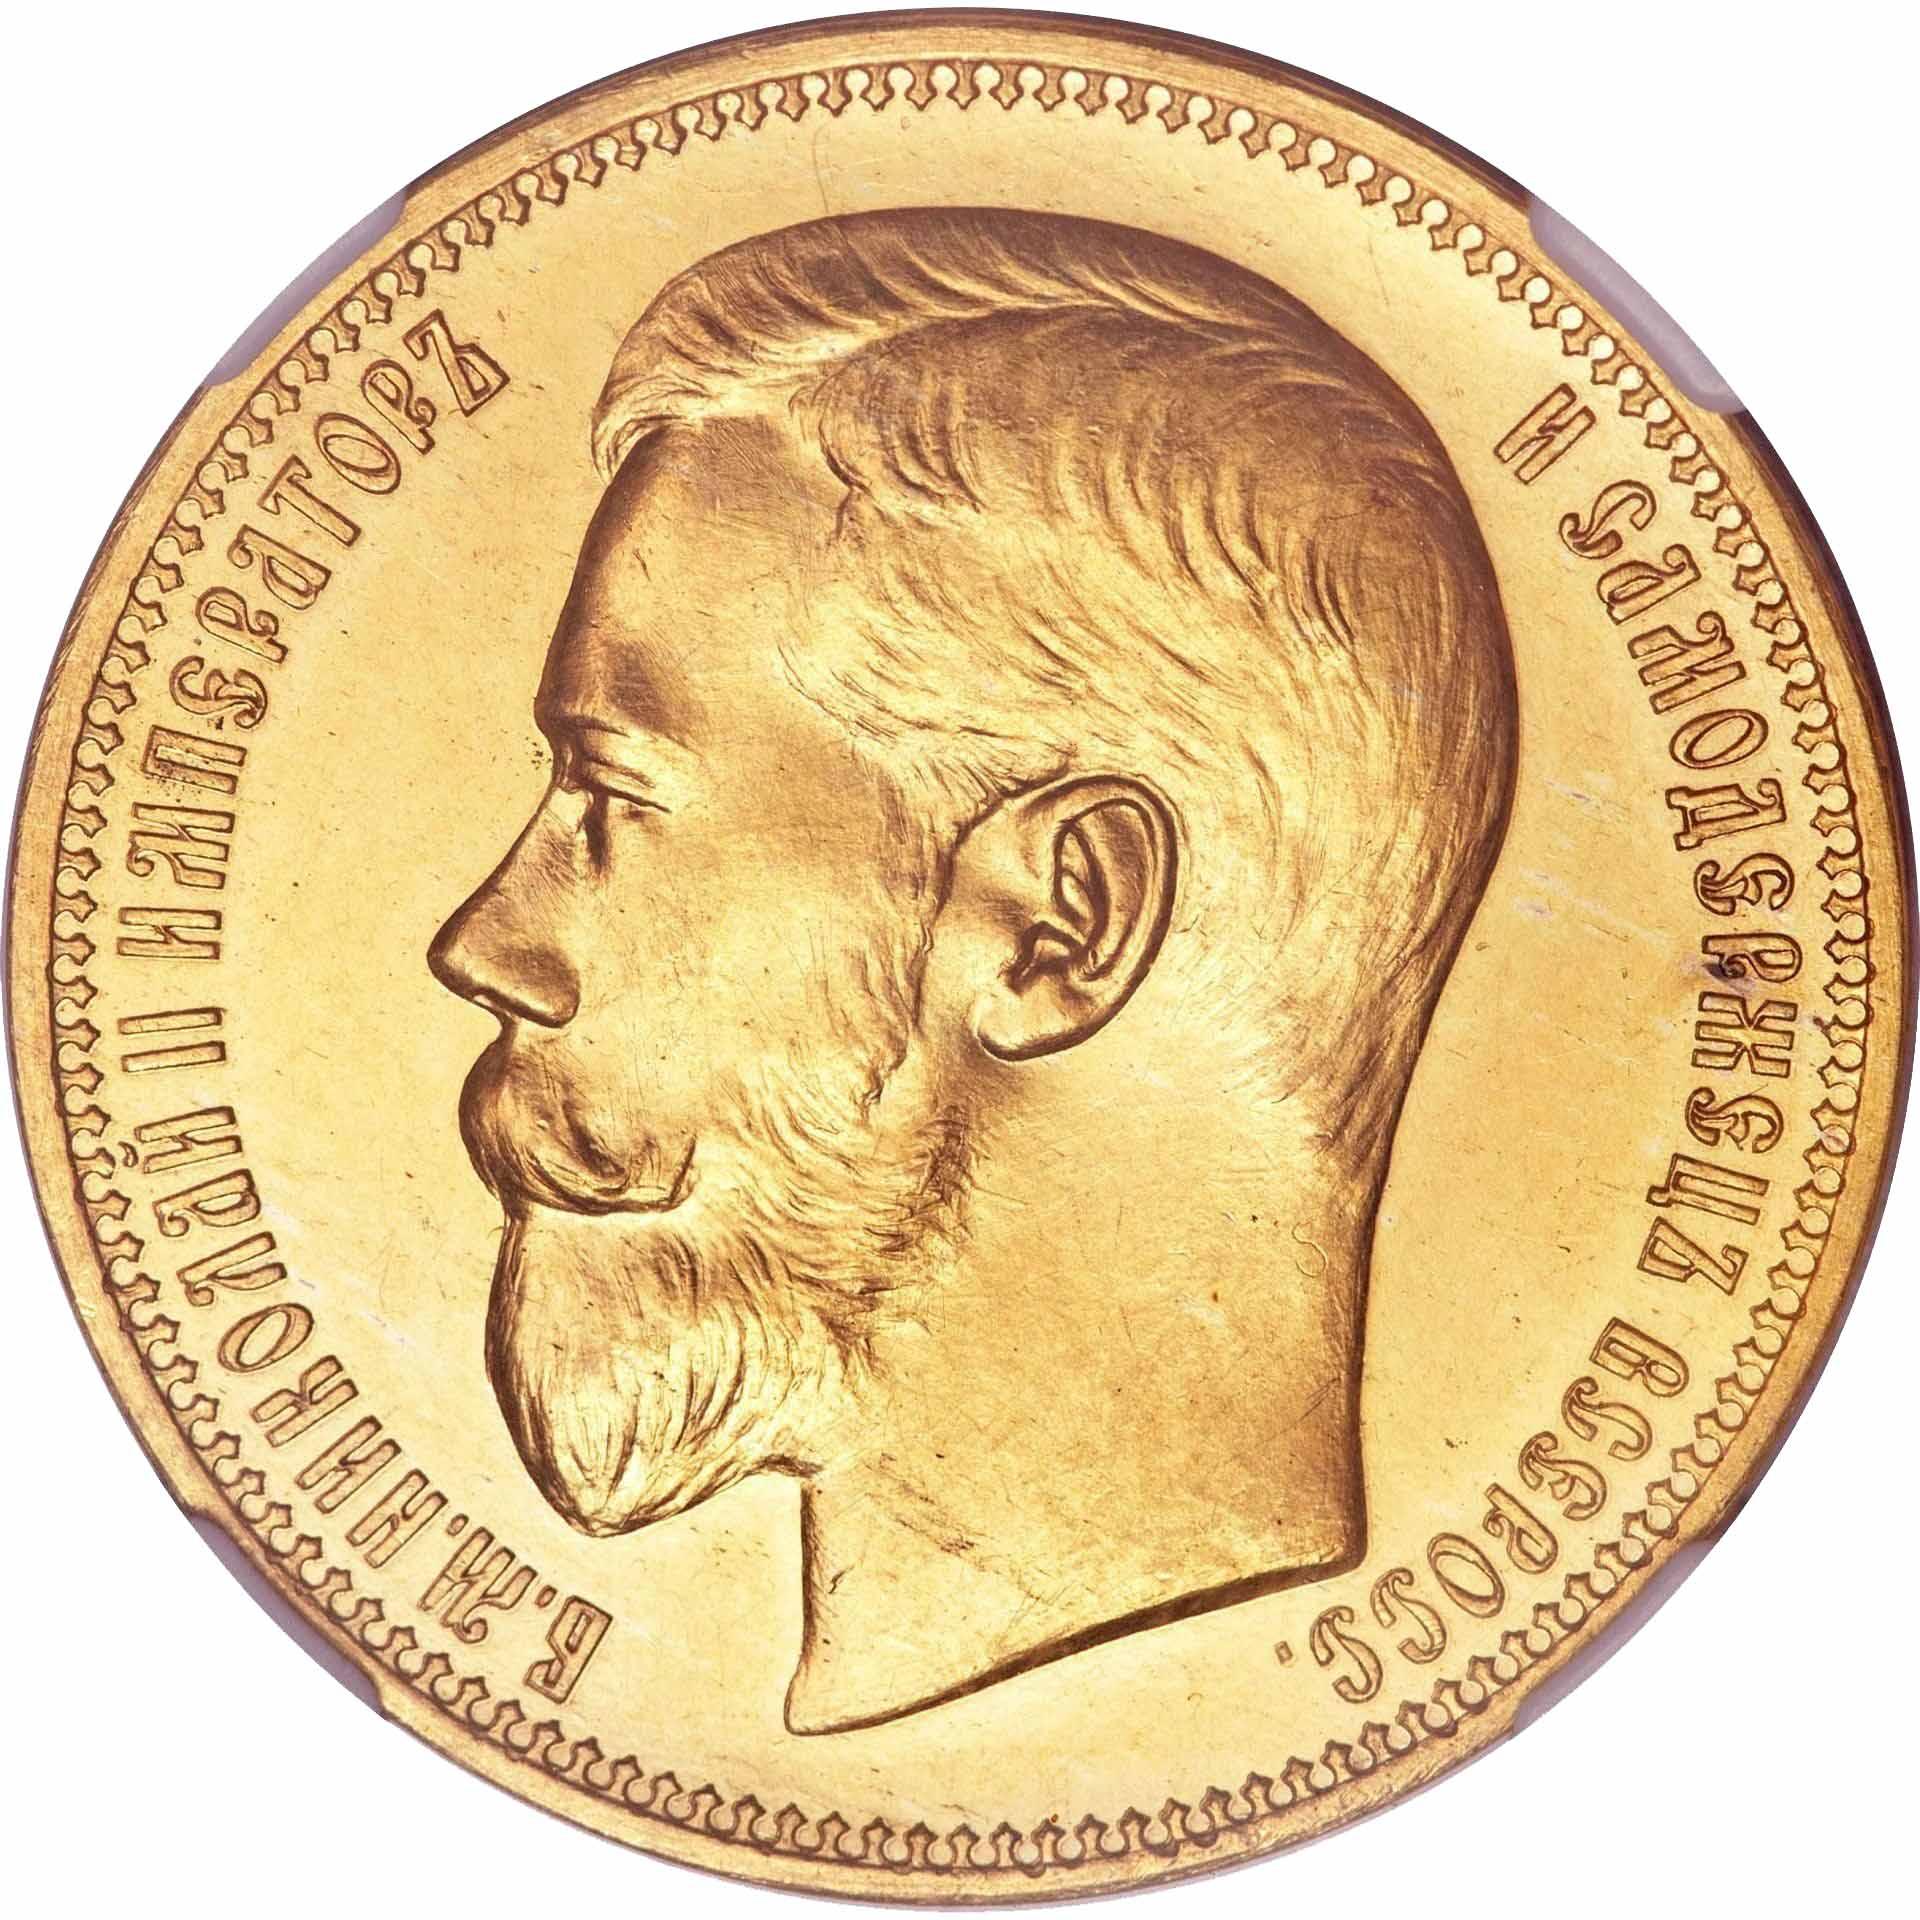 25 рублей 1896, *, коронация Николая II2